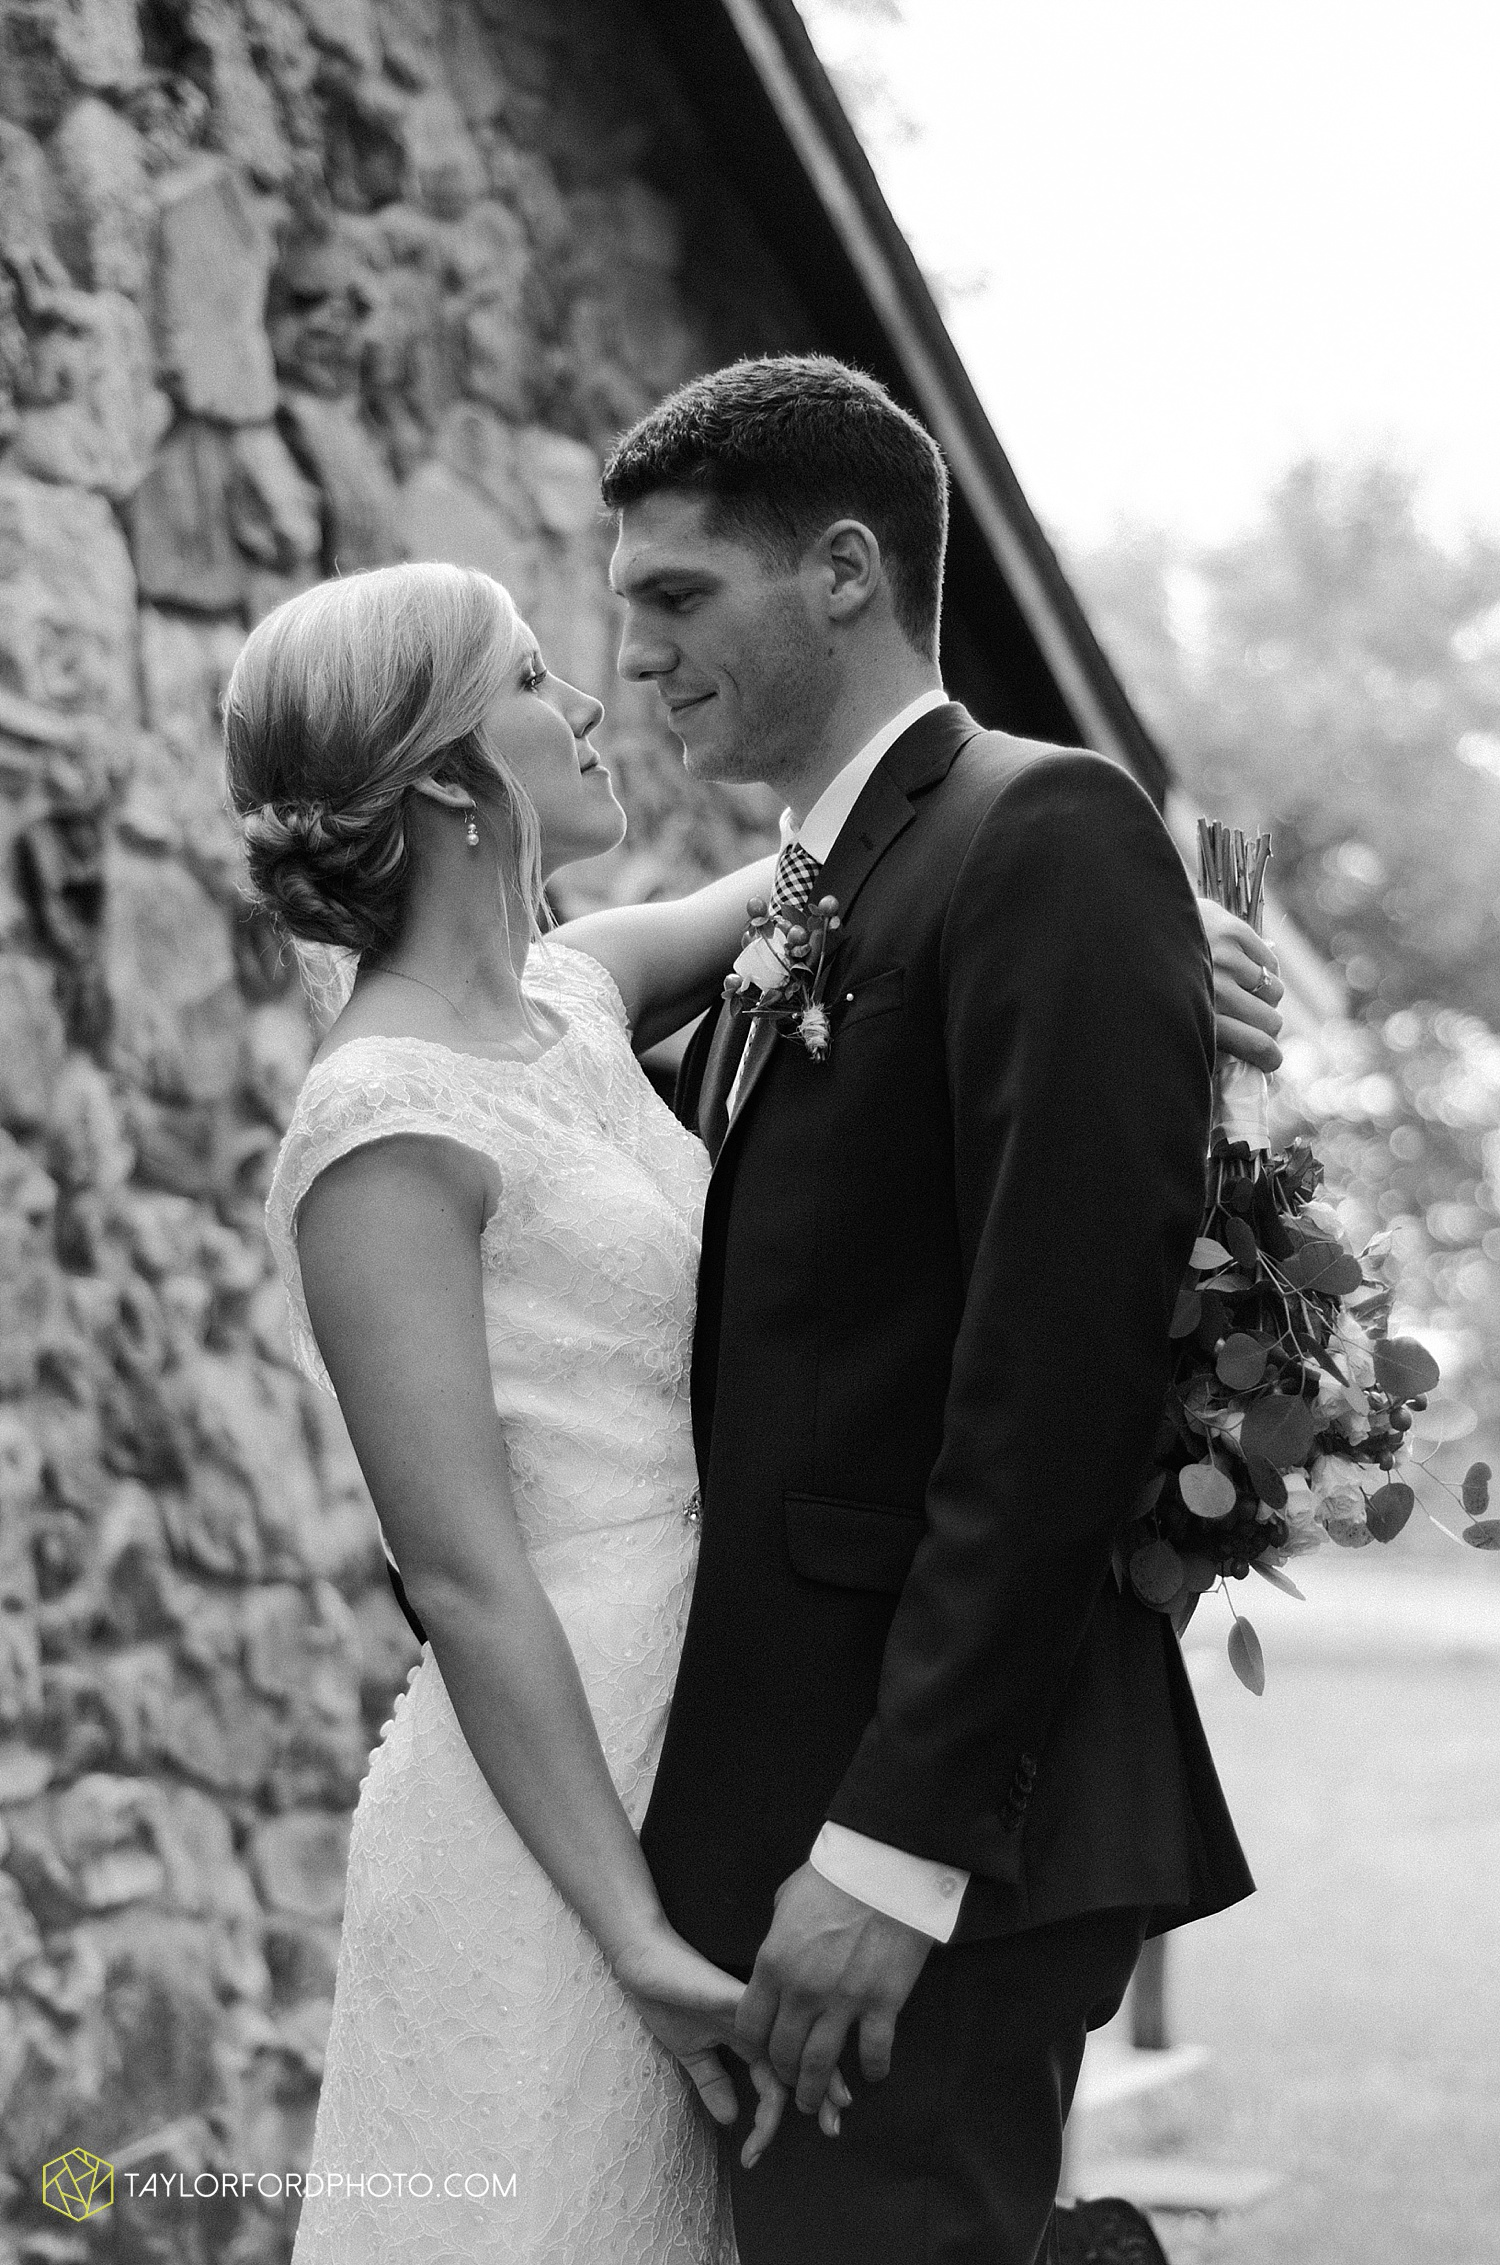 fort_wayne_indiana_van_wert_columbus_ohio_nashville_tennessee_photographer_taylor_ford_shoppes_at_old_mill_wedding_0718.jpg